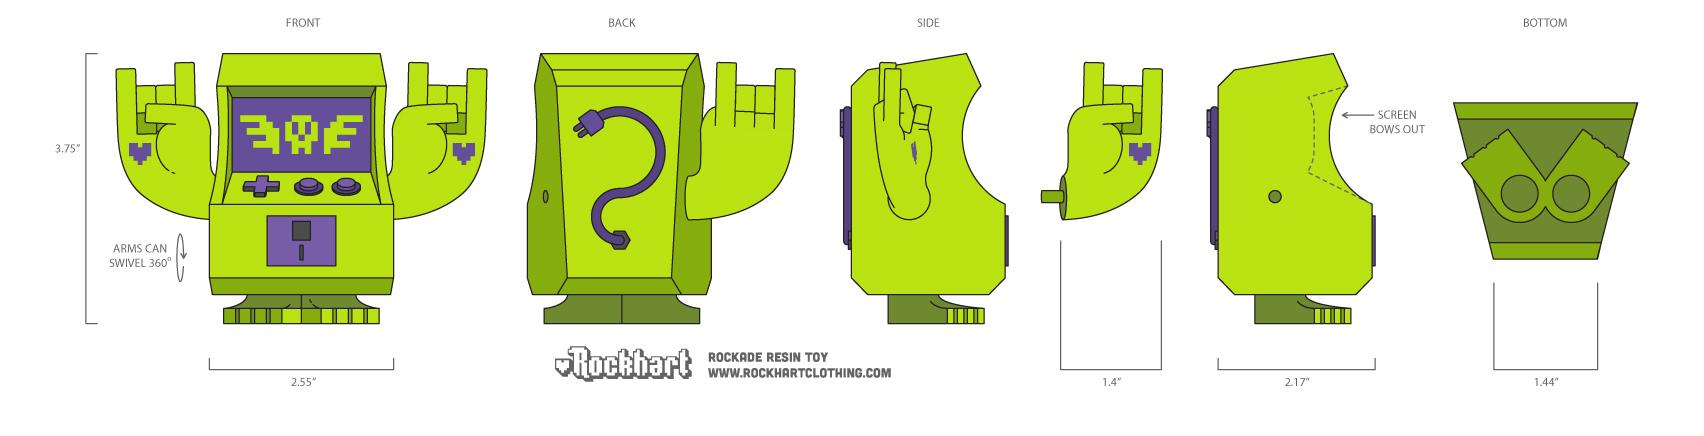 Rockade  - image 9 - student project